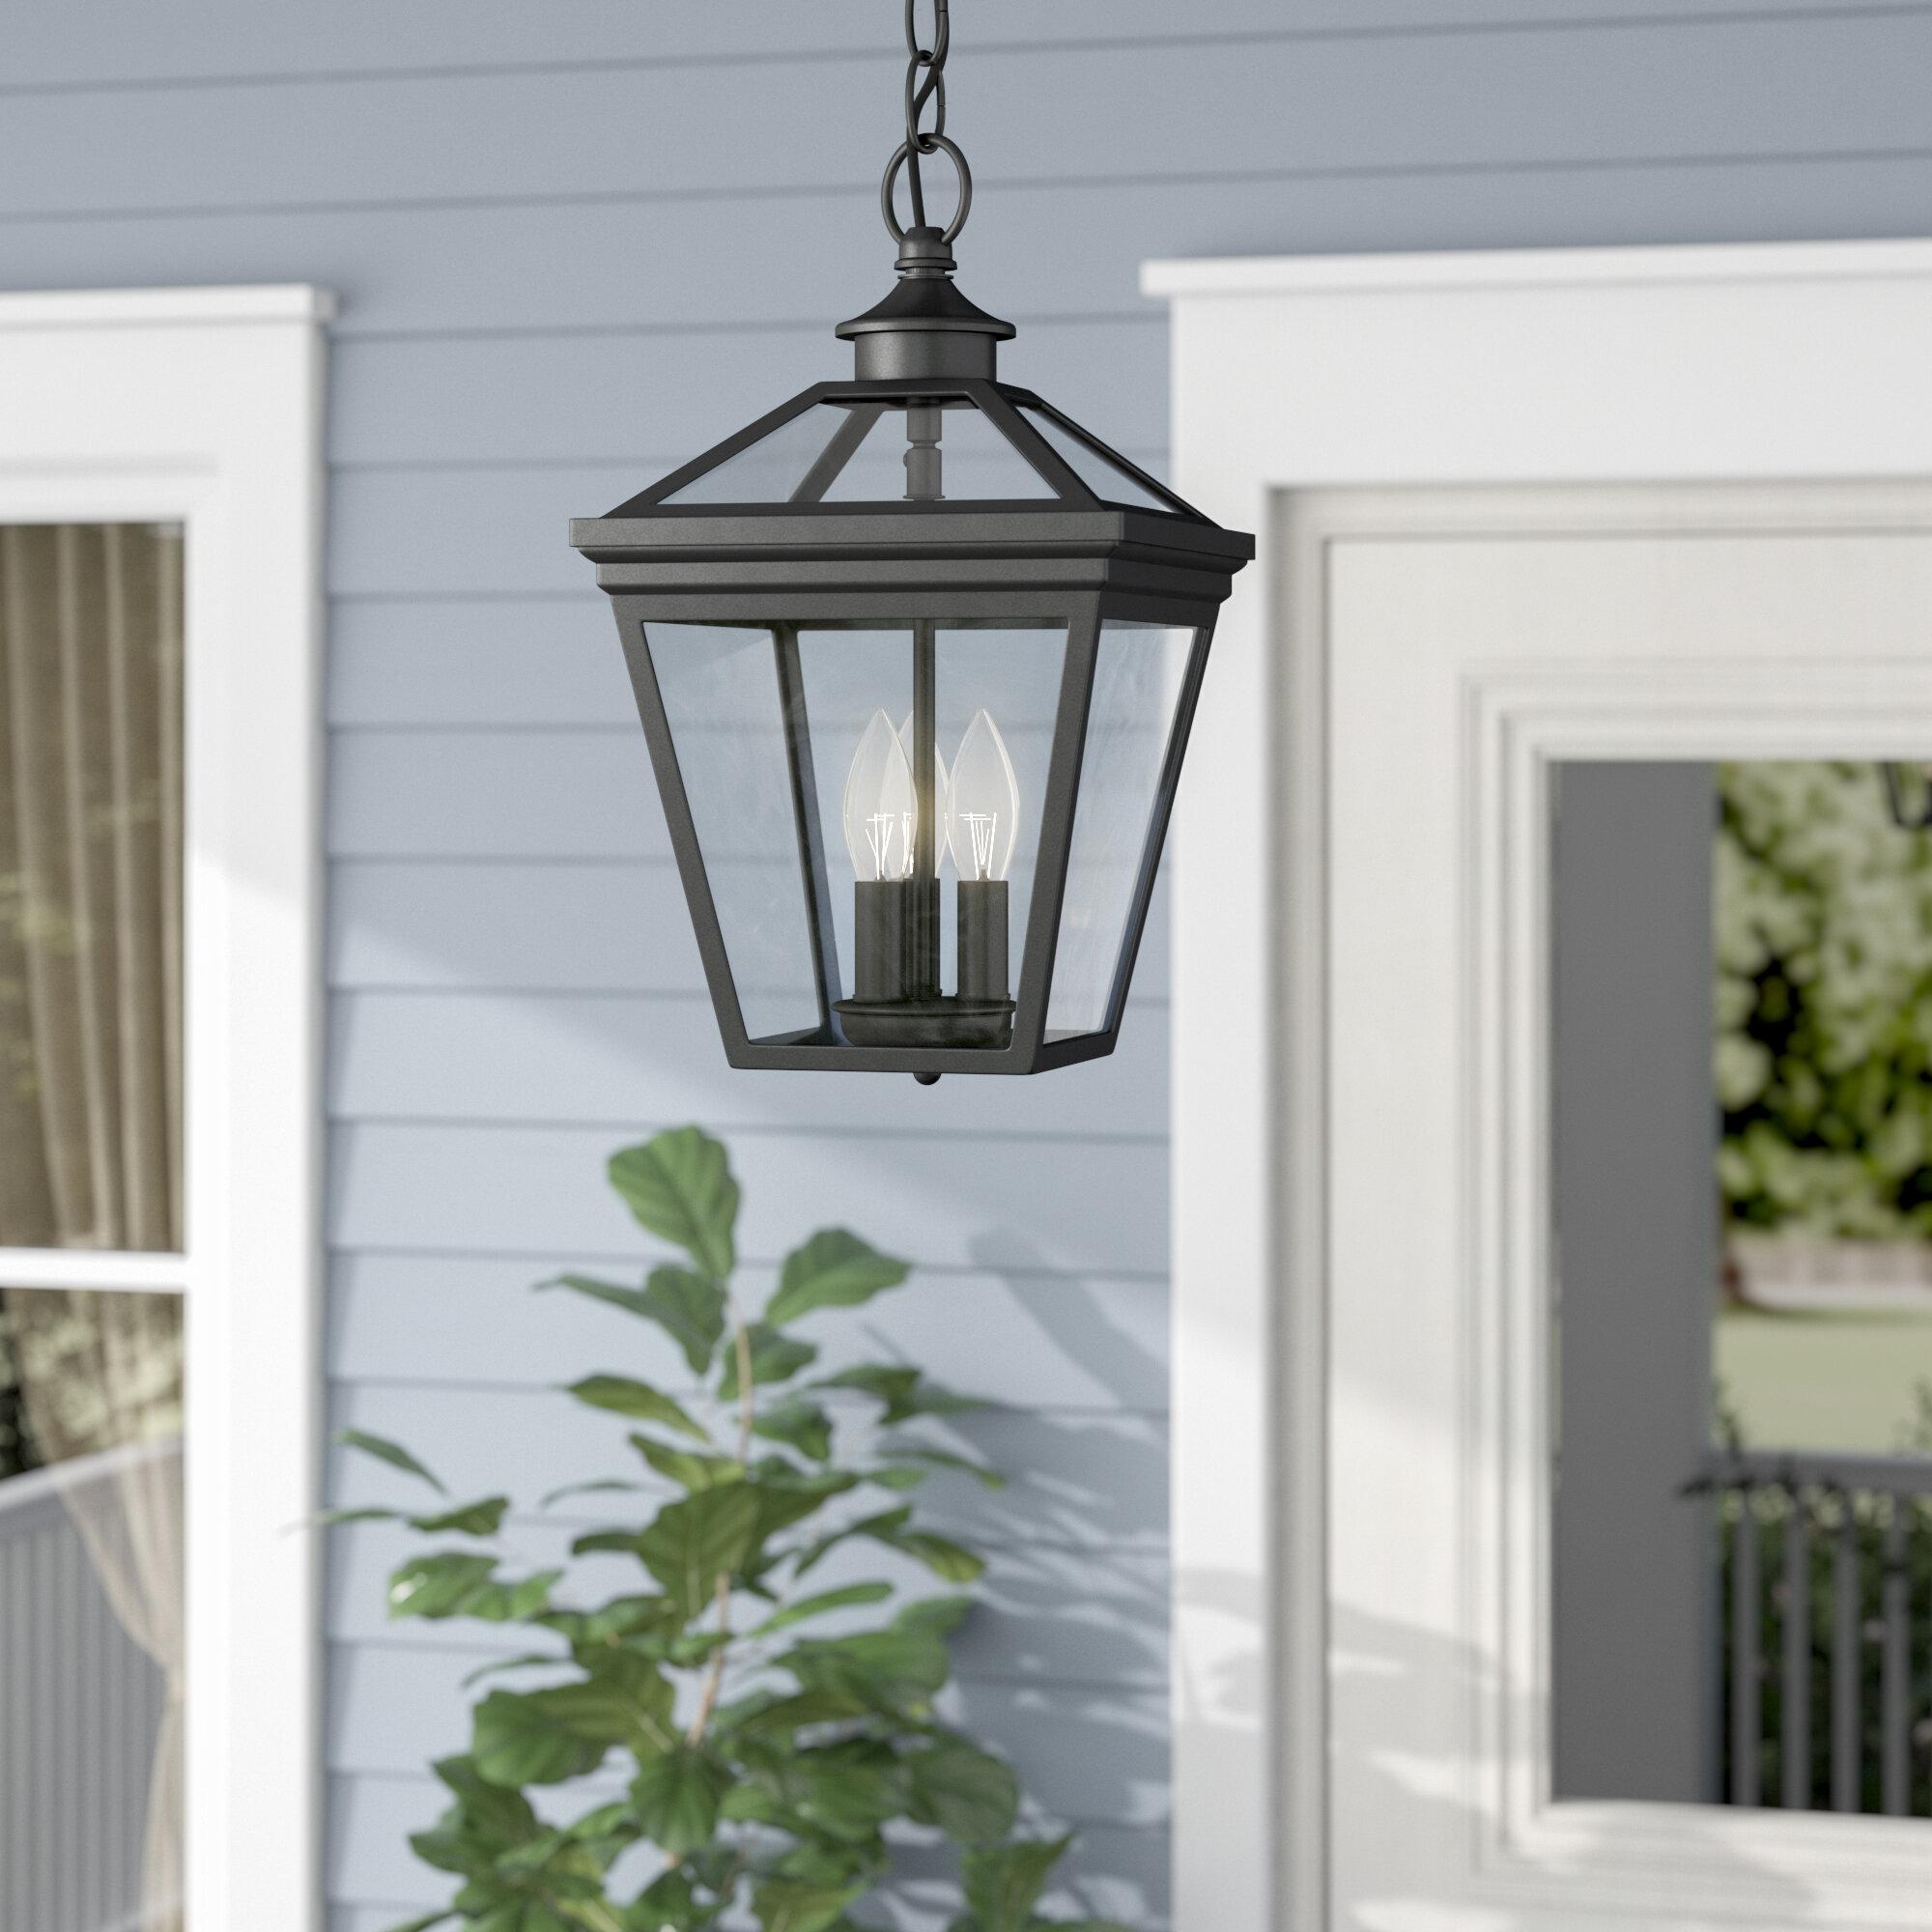 Darby Home Co Coleg 3-Light Outdoor Hanging Lantern & Reviews | Wayfair